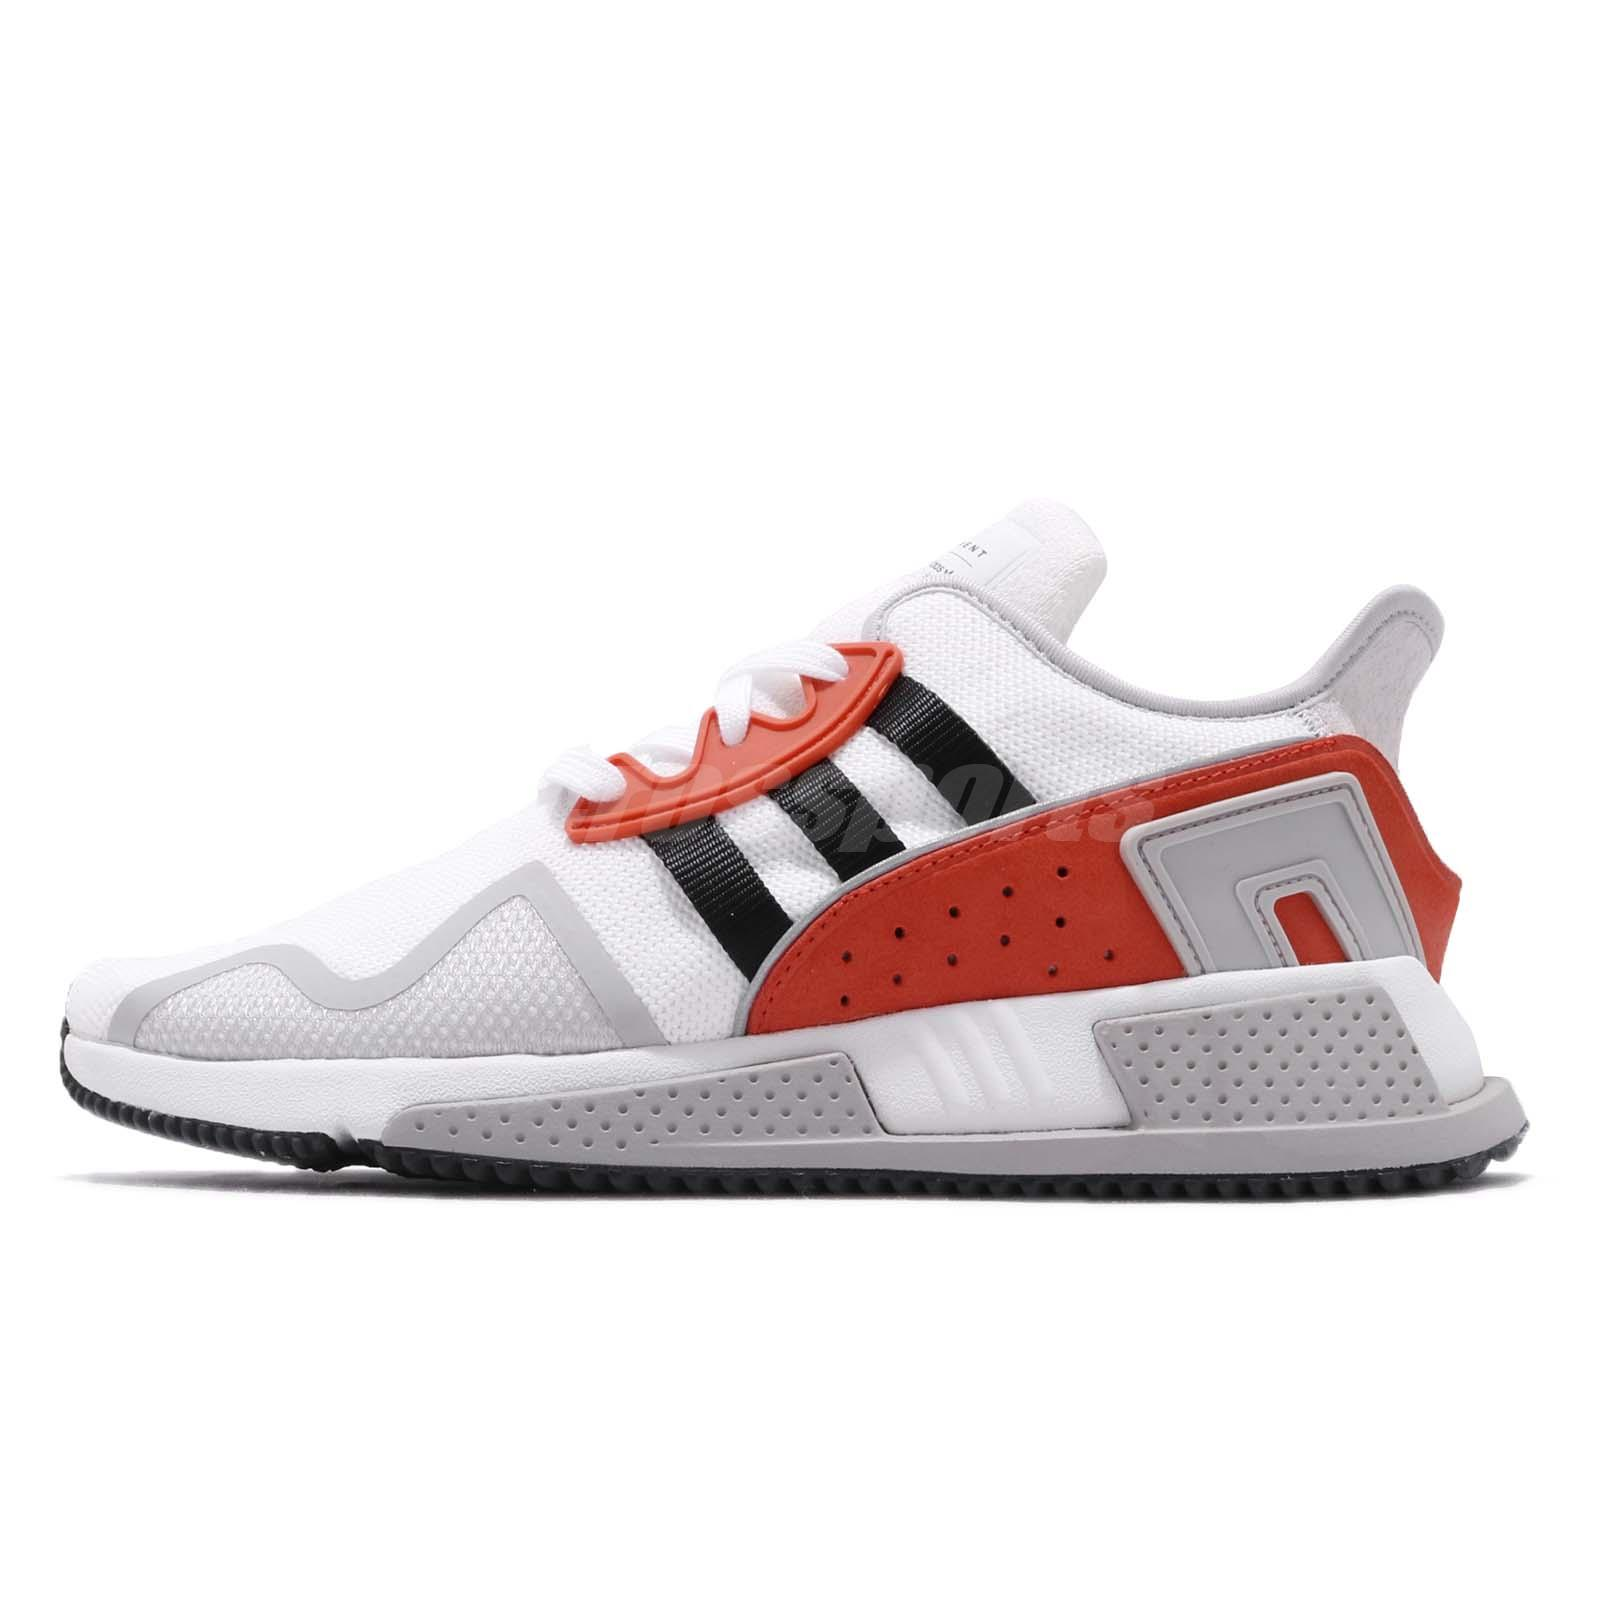 hot sale online 9e1e8 f5398 adidas Originals EQT Cushion ADV White Black Hi-Res Red Men Running Shoes  BB7180